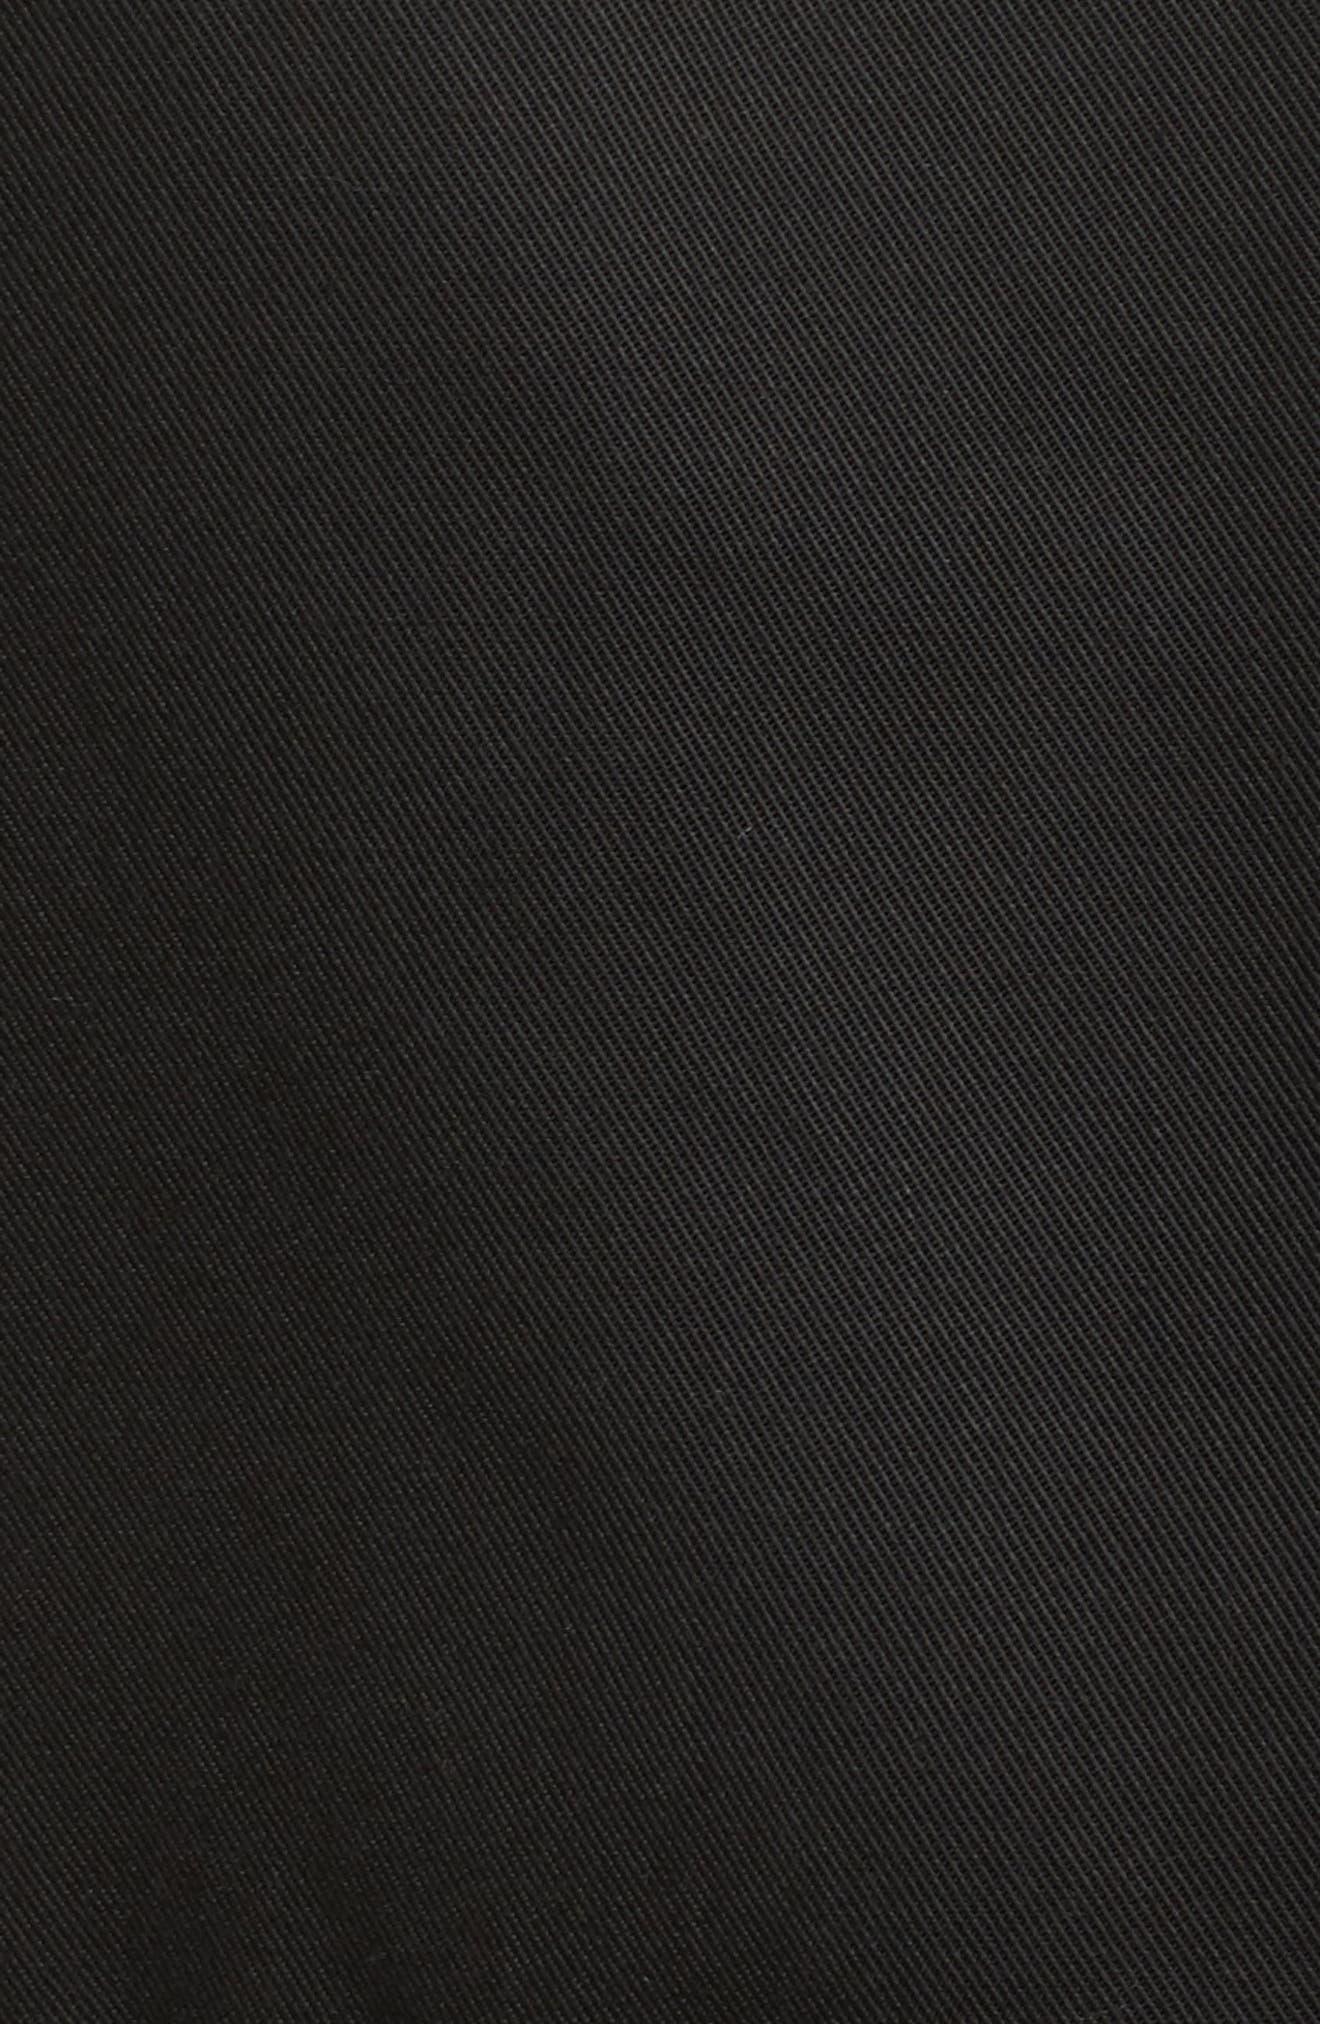 Ruffle Wrap Dress,                             Alternate thumbnail 5, color,                             001